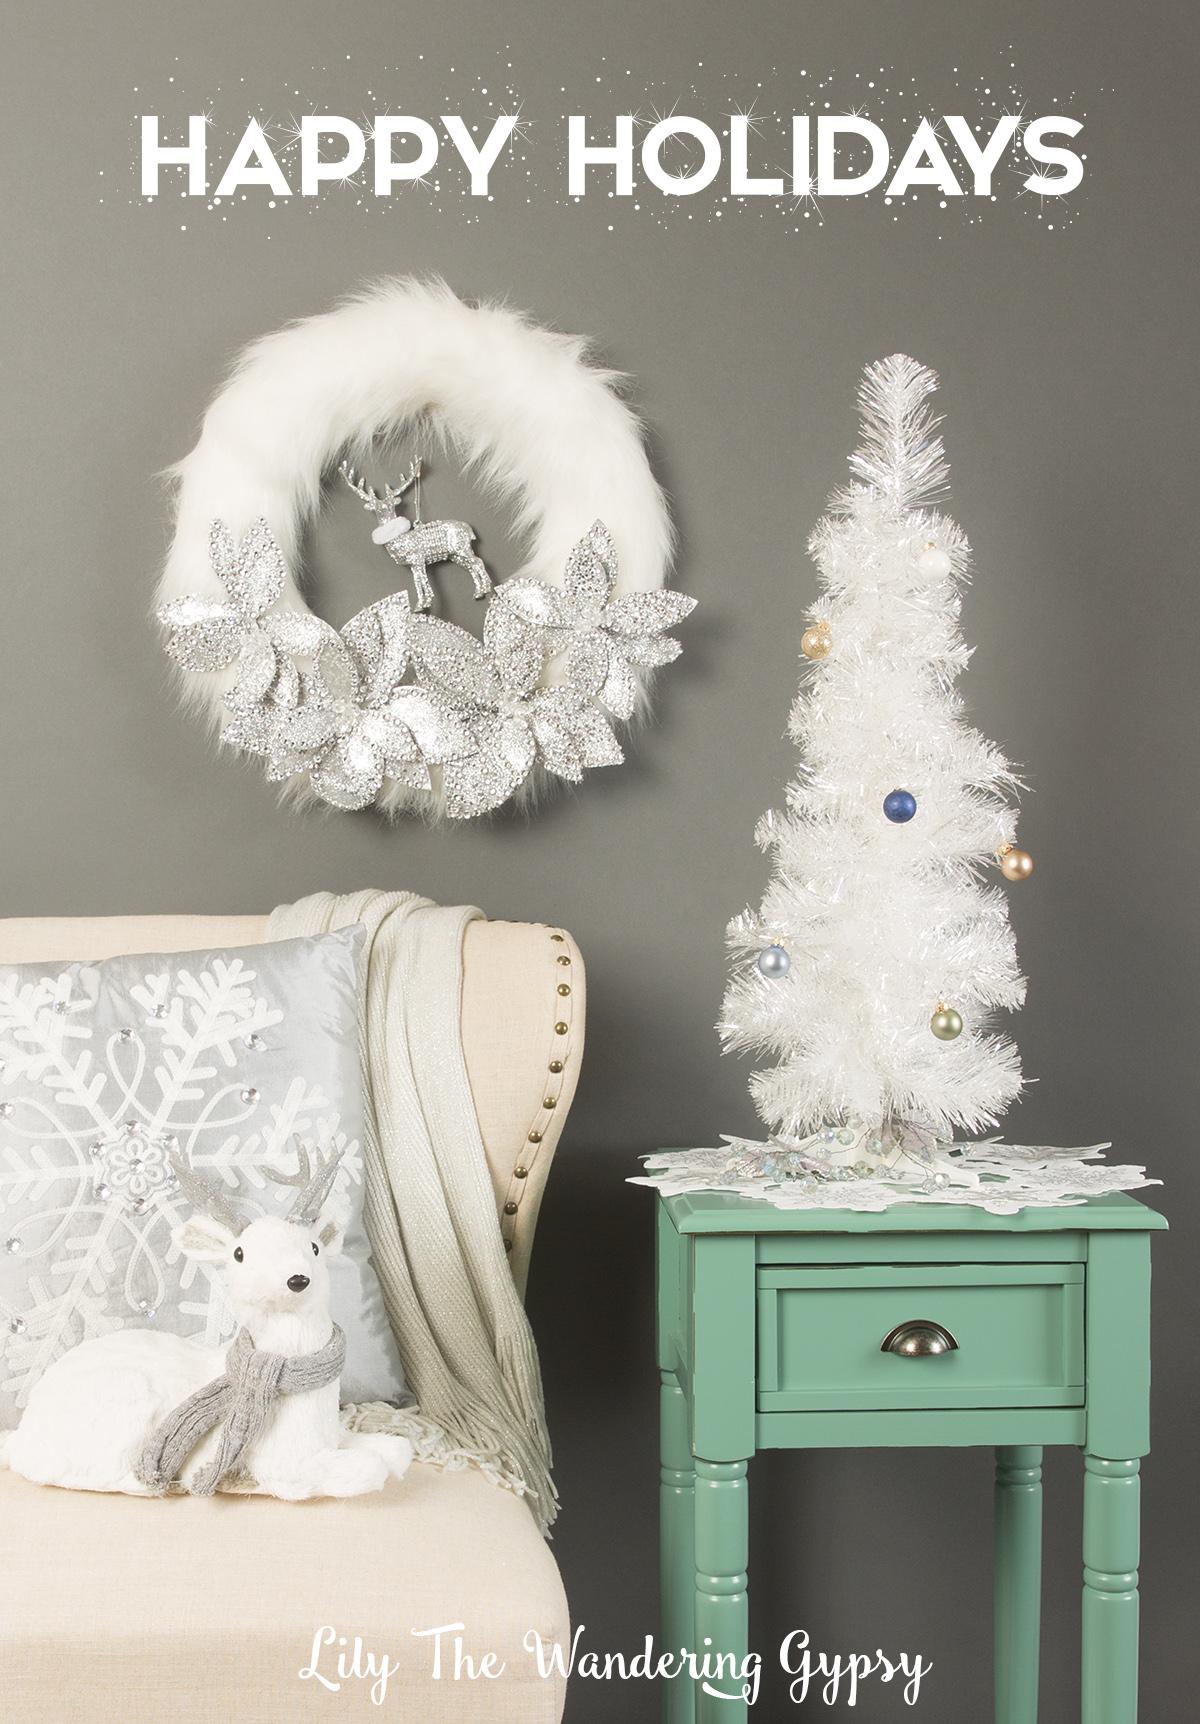 #BigLotsHoliday - cute home decor items!